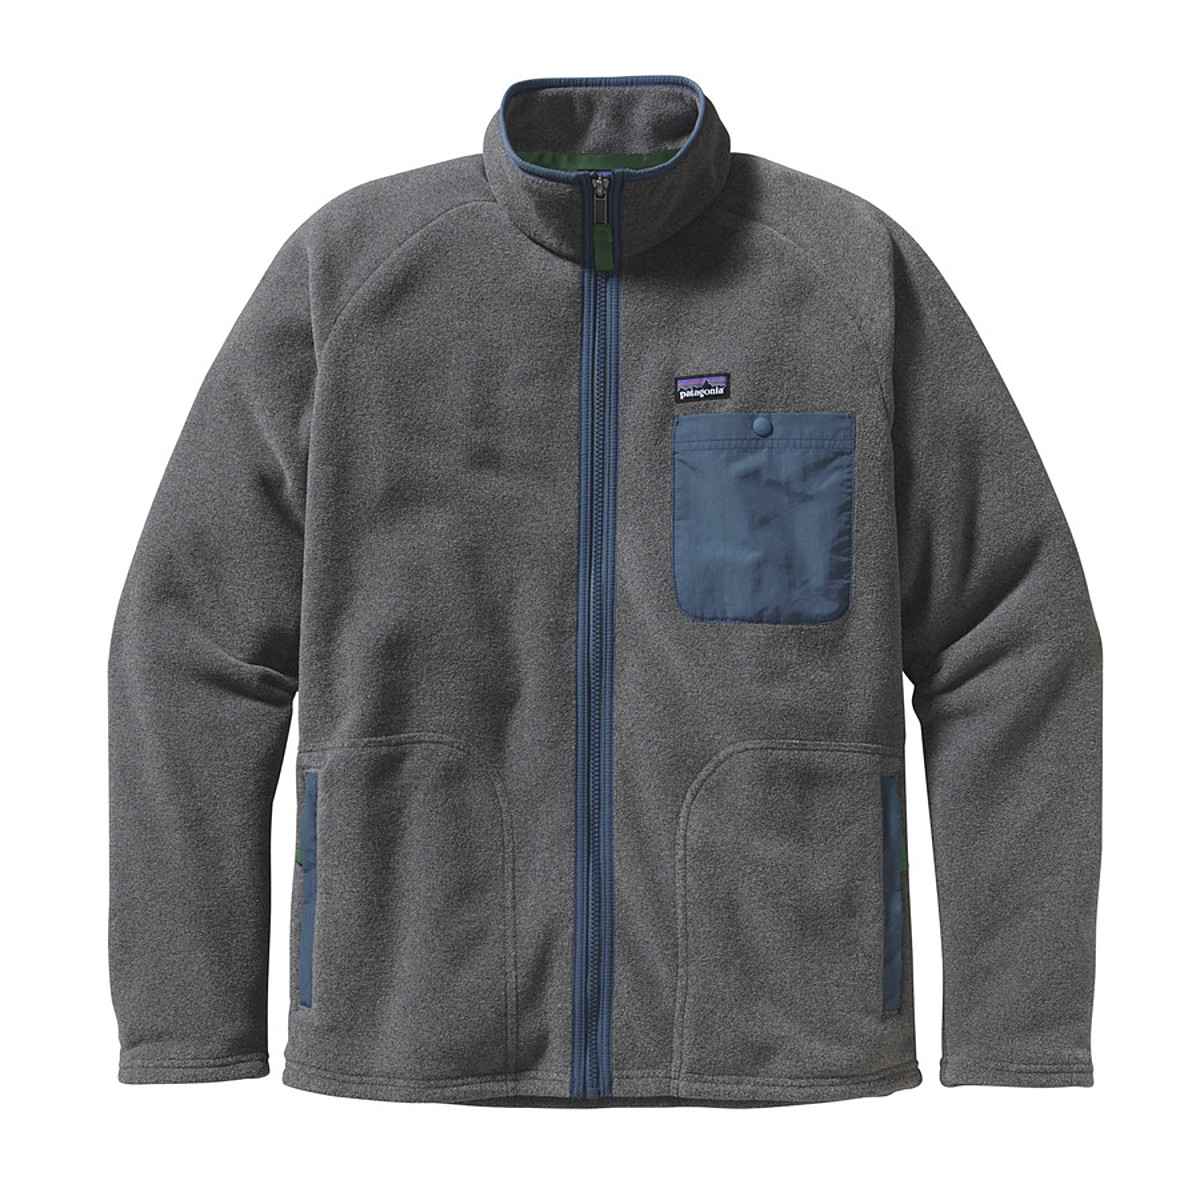 Patagonia Karstens Jacket